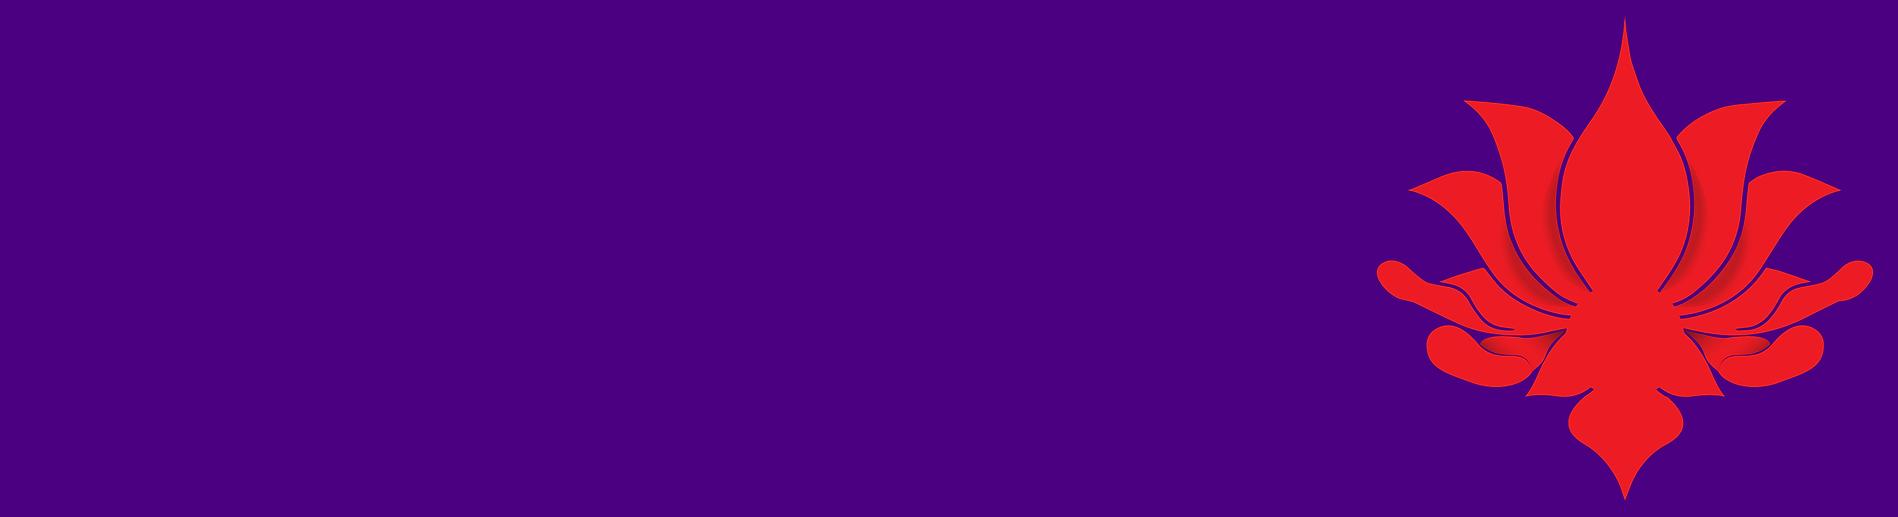 Purple solo.png